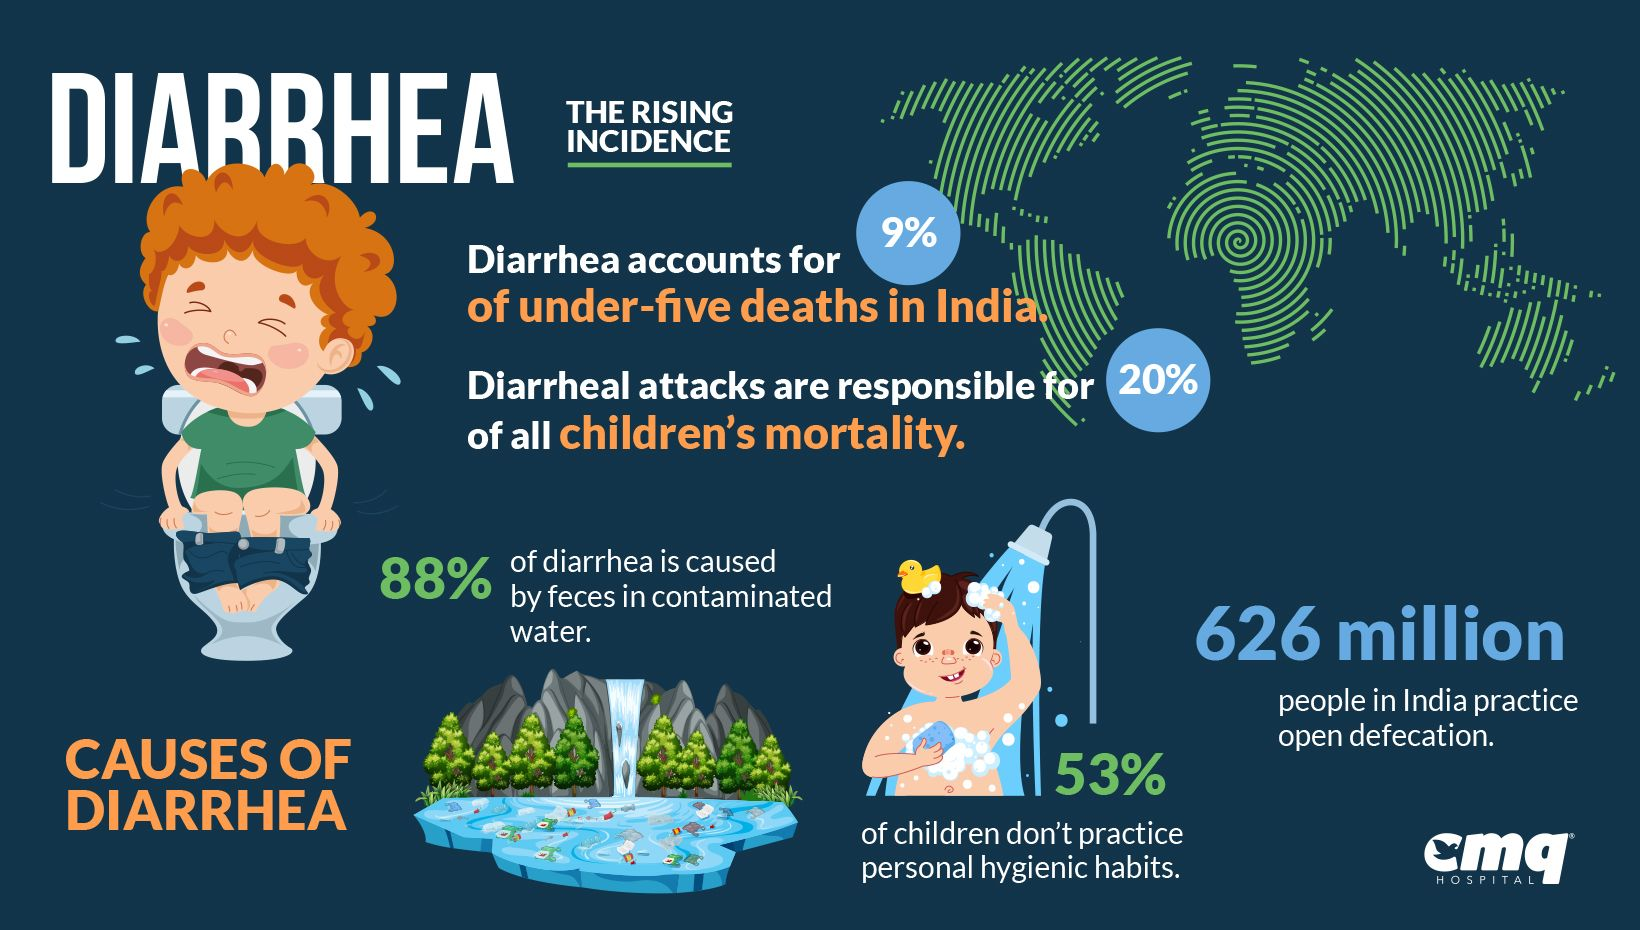 Diarrhea The Rising Incidence